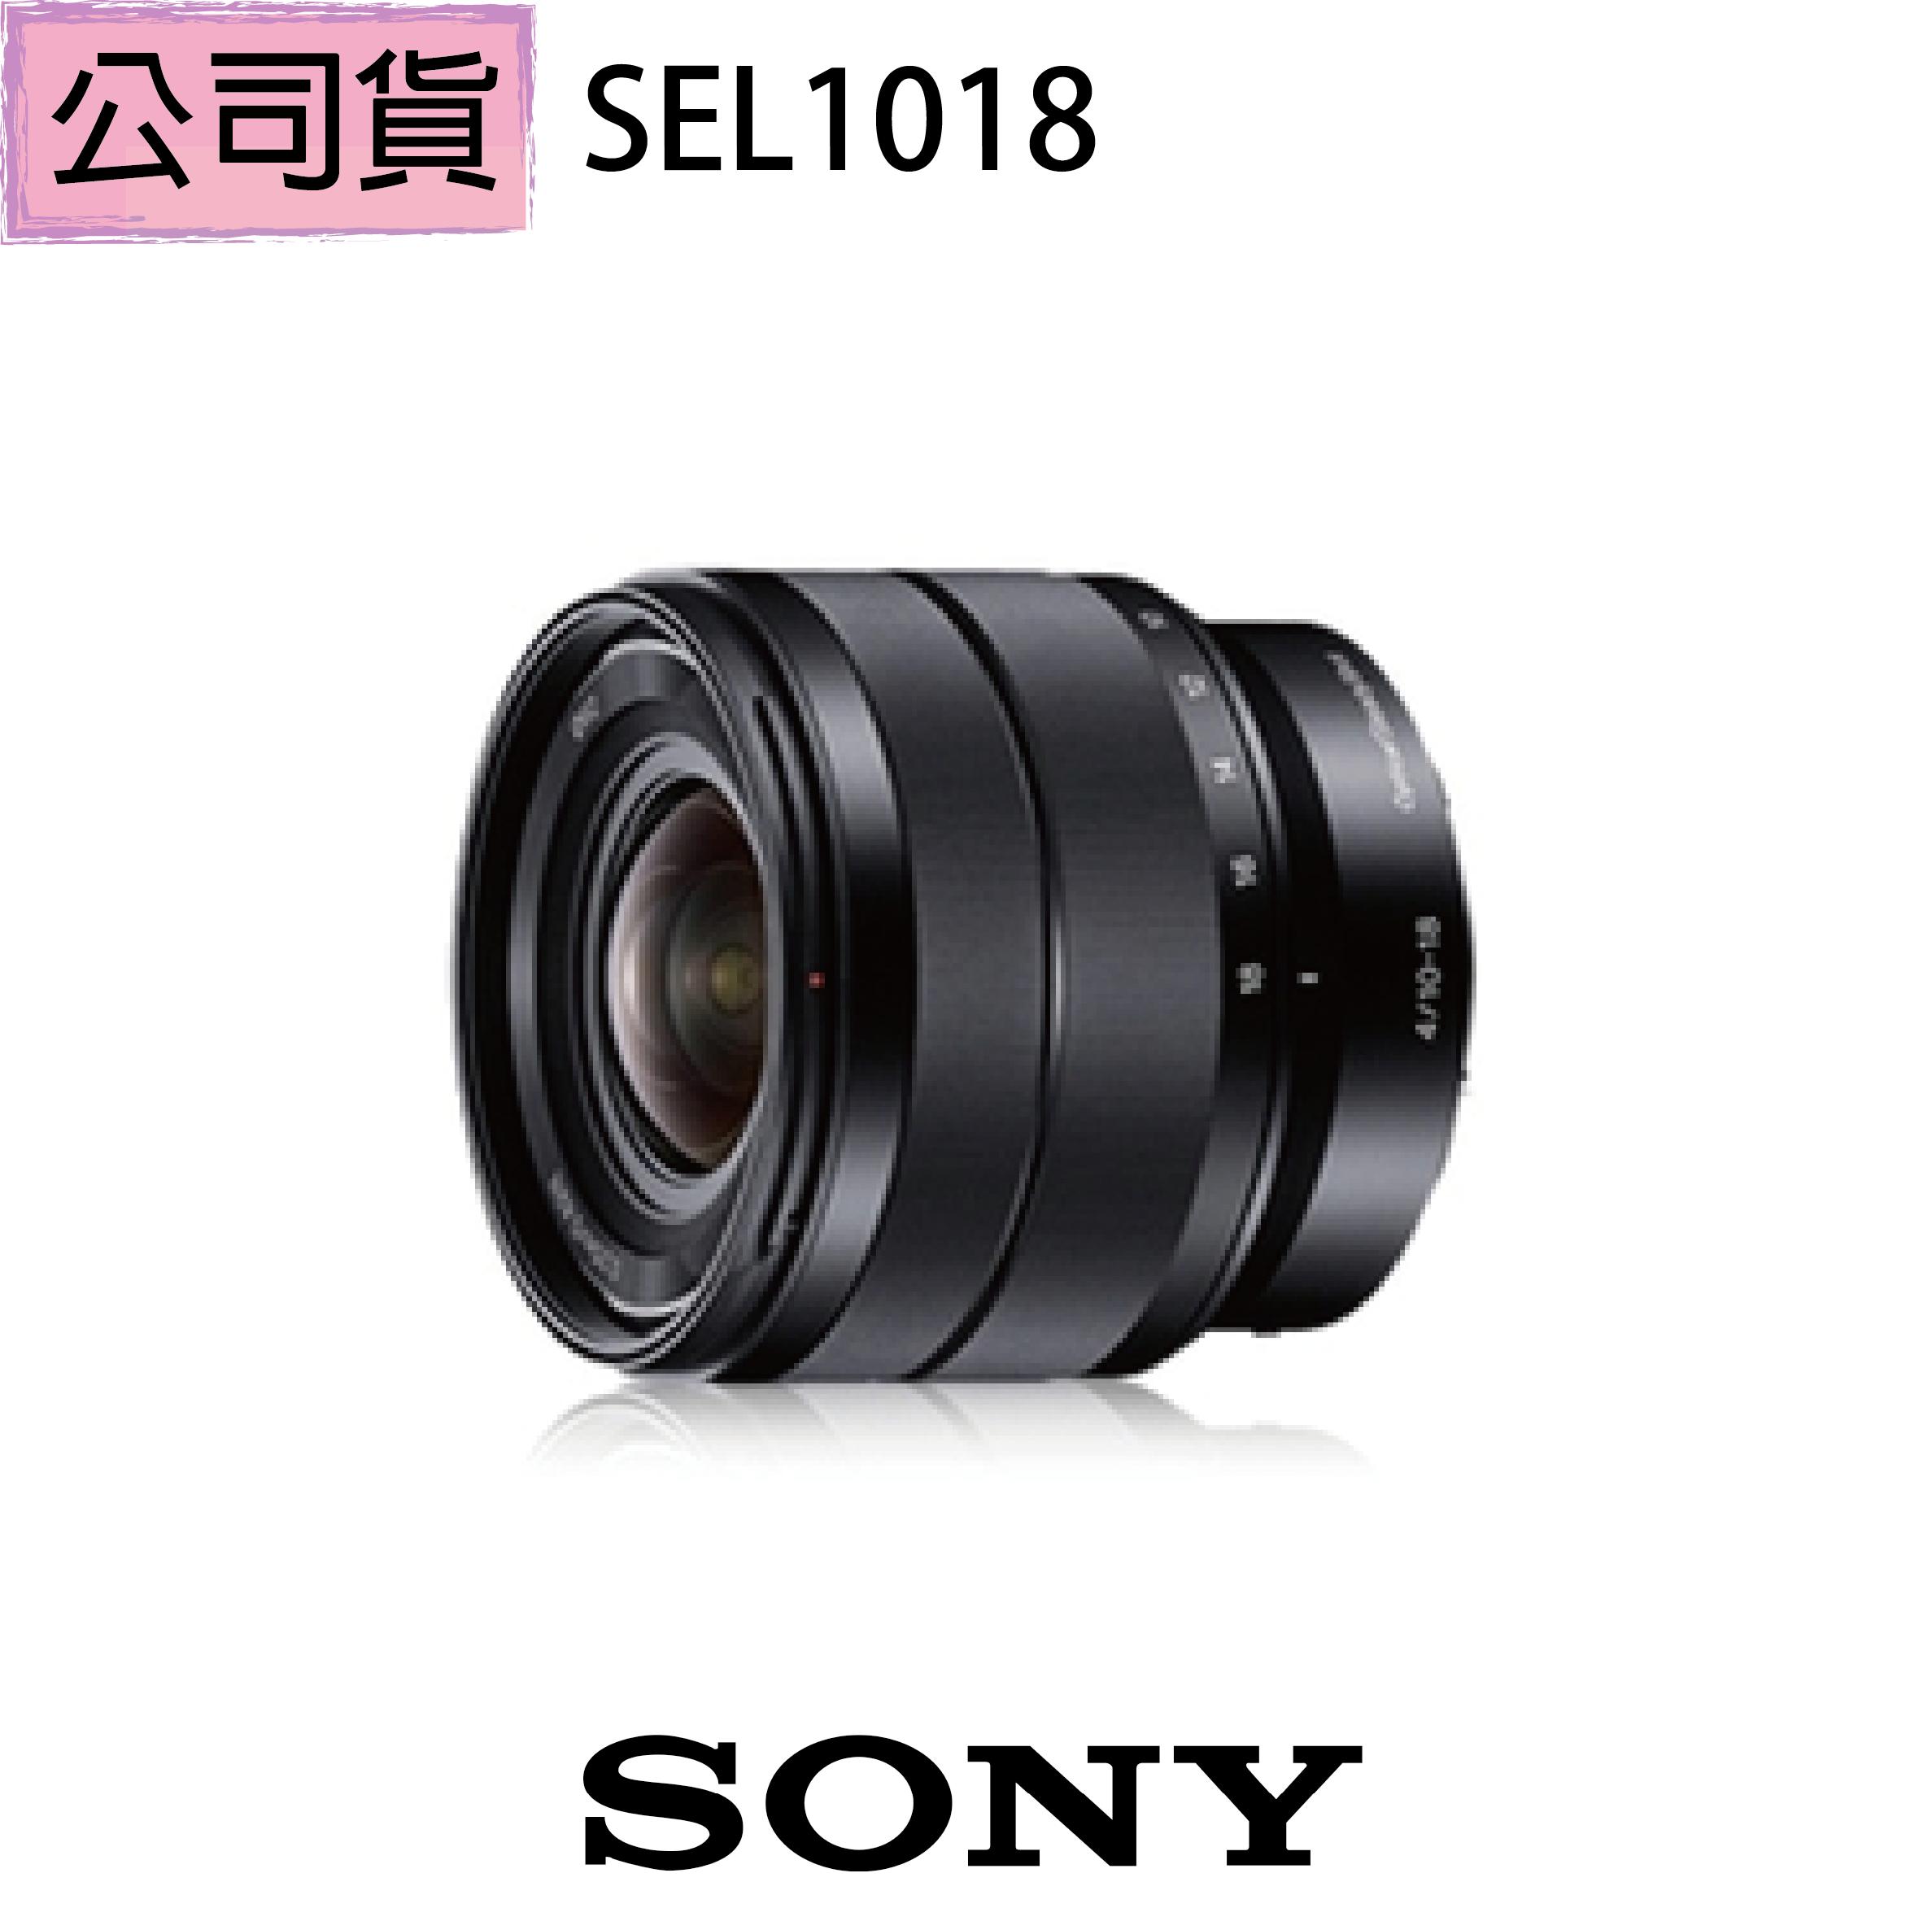 【SONY】SEL1018 超廣角變焦鏡 (公司貨)